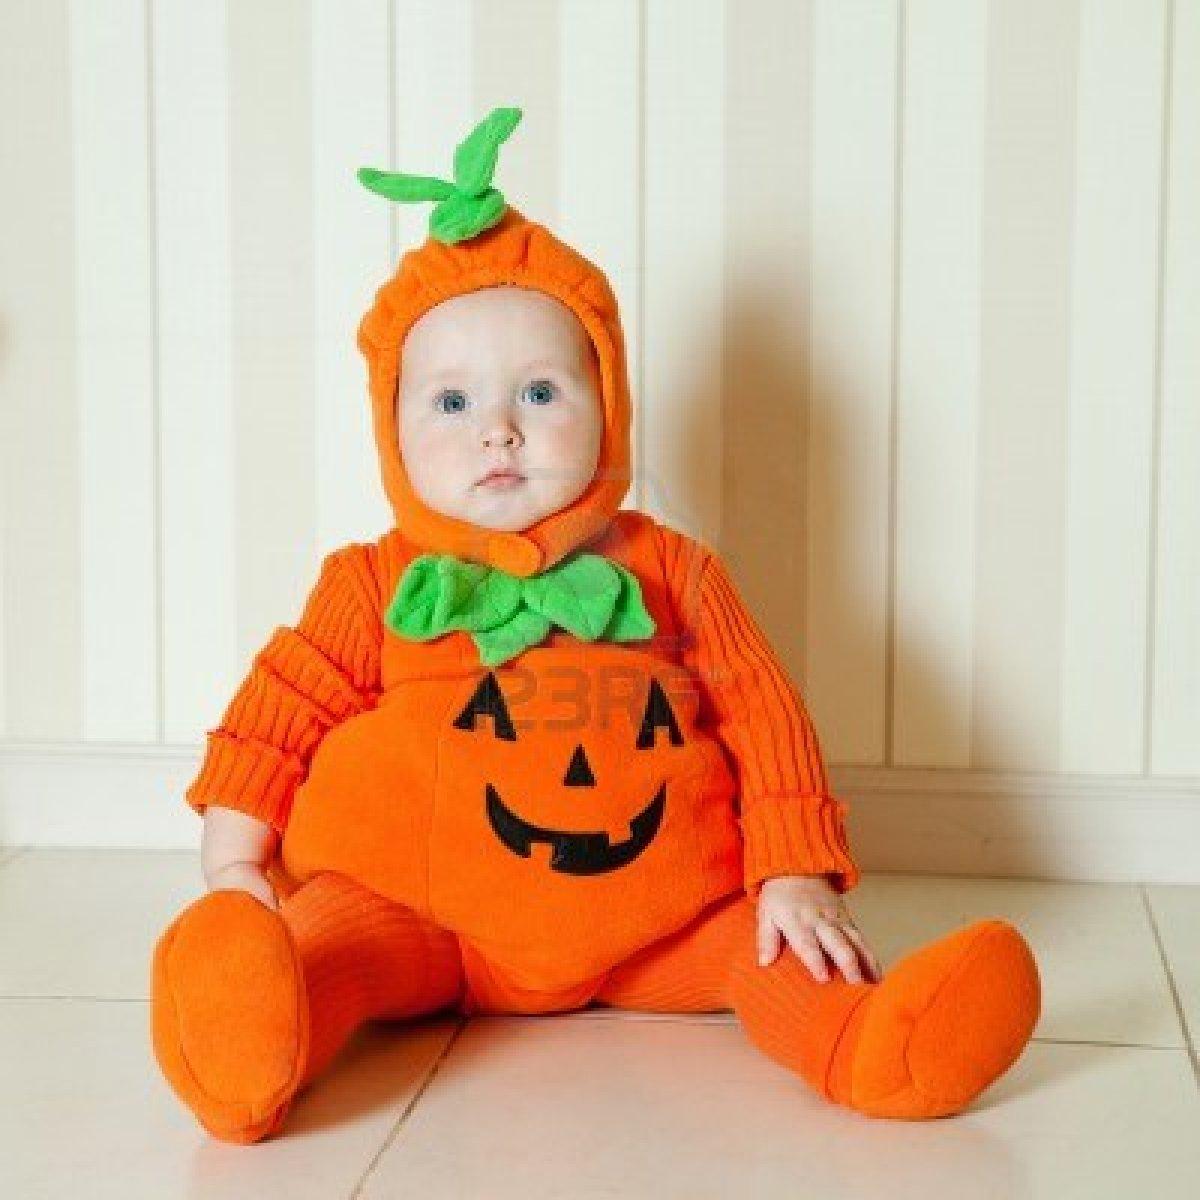 Disfraz Para Bebes Decoracin Del Hogar Prosalocom